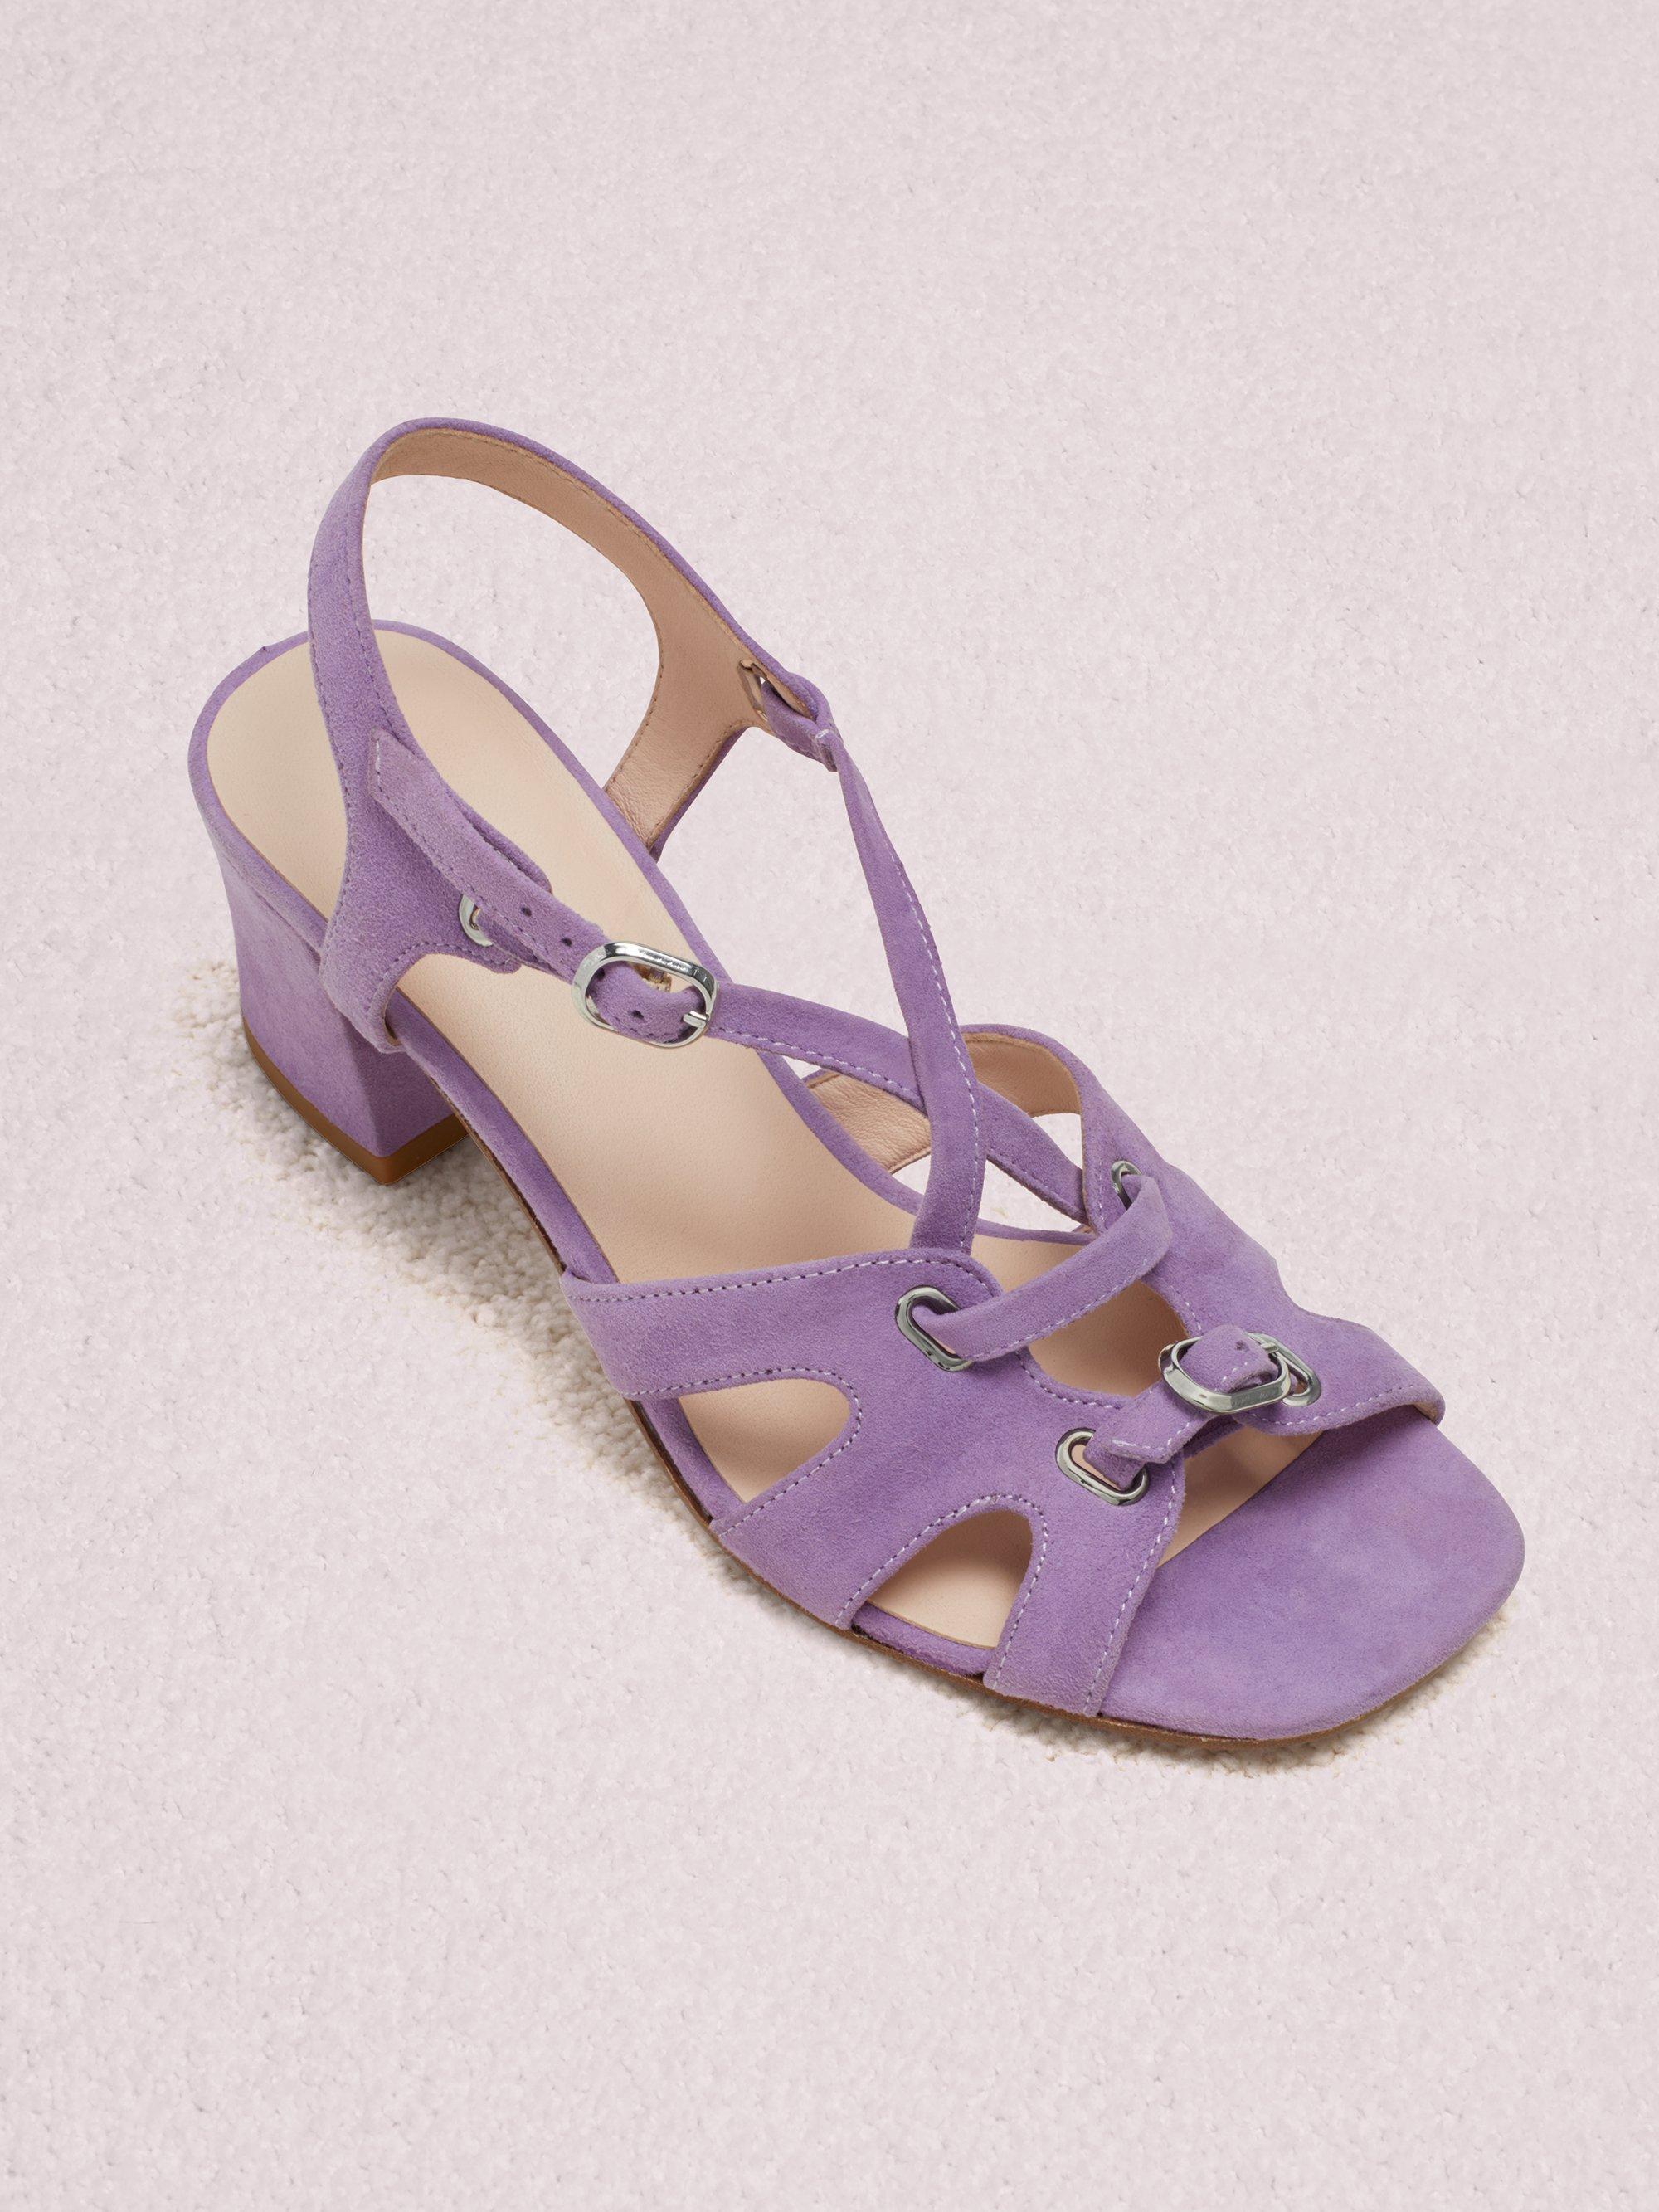 754dcaa7e410 Lyst - Kate Spade Ella Sandals in Purple